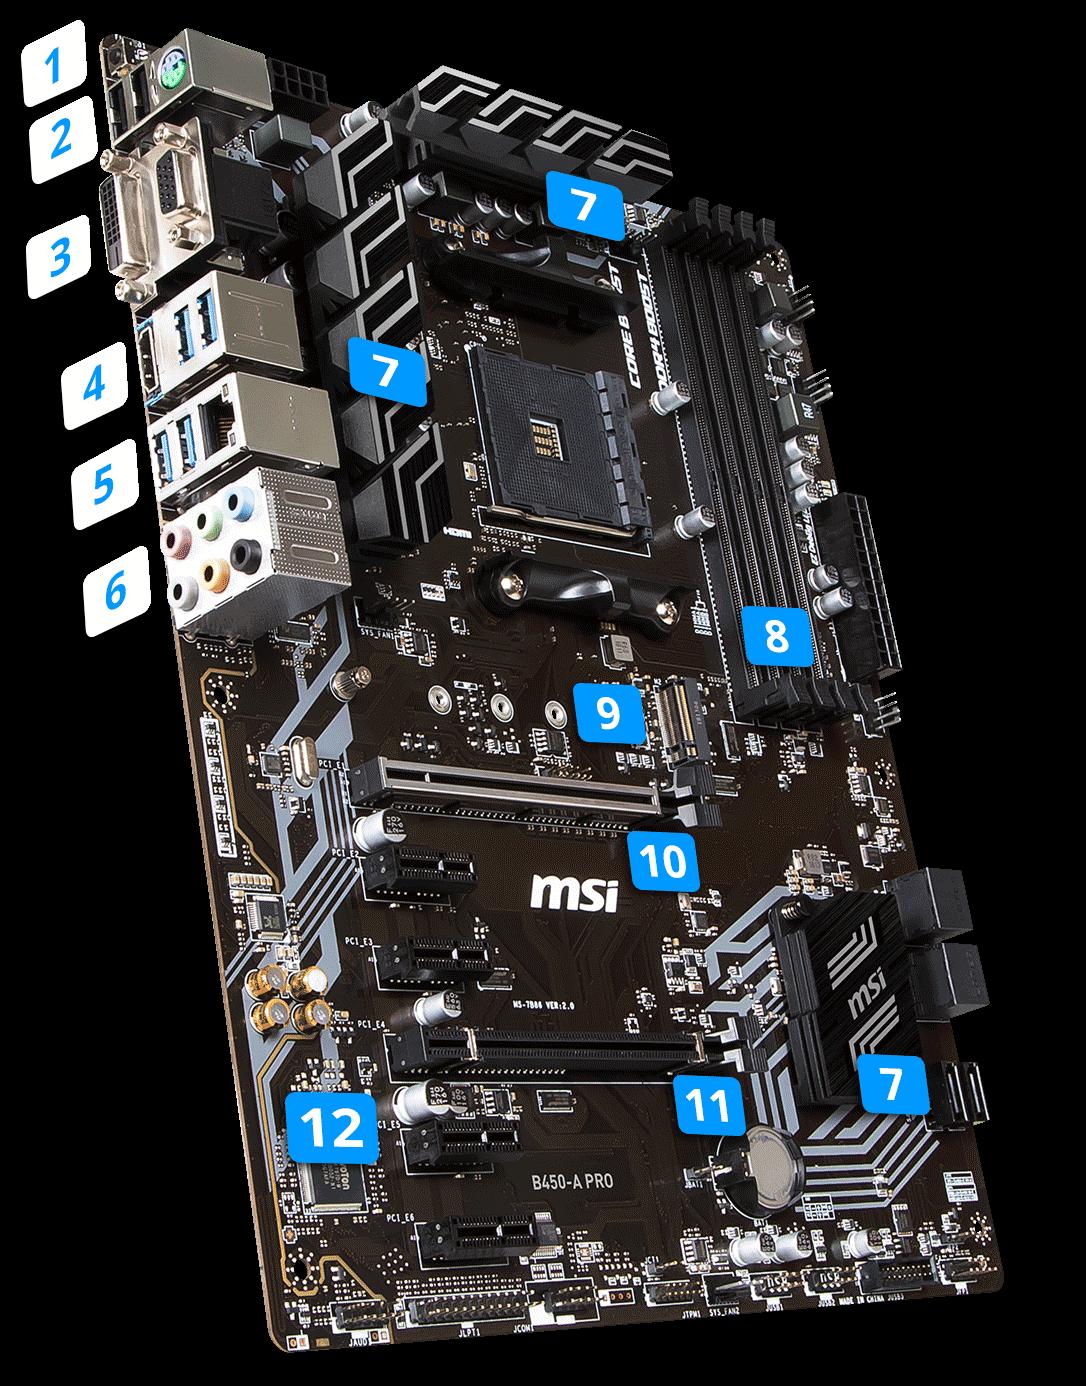 Bo mạch chủ Mainboard MSI B450 A-PRO